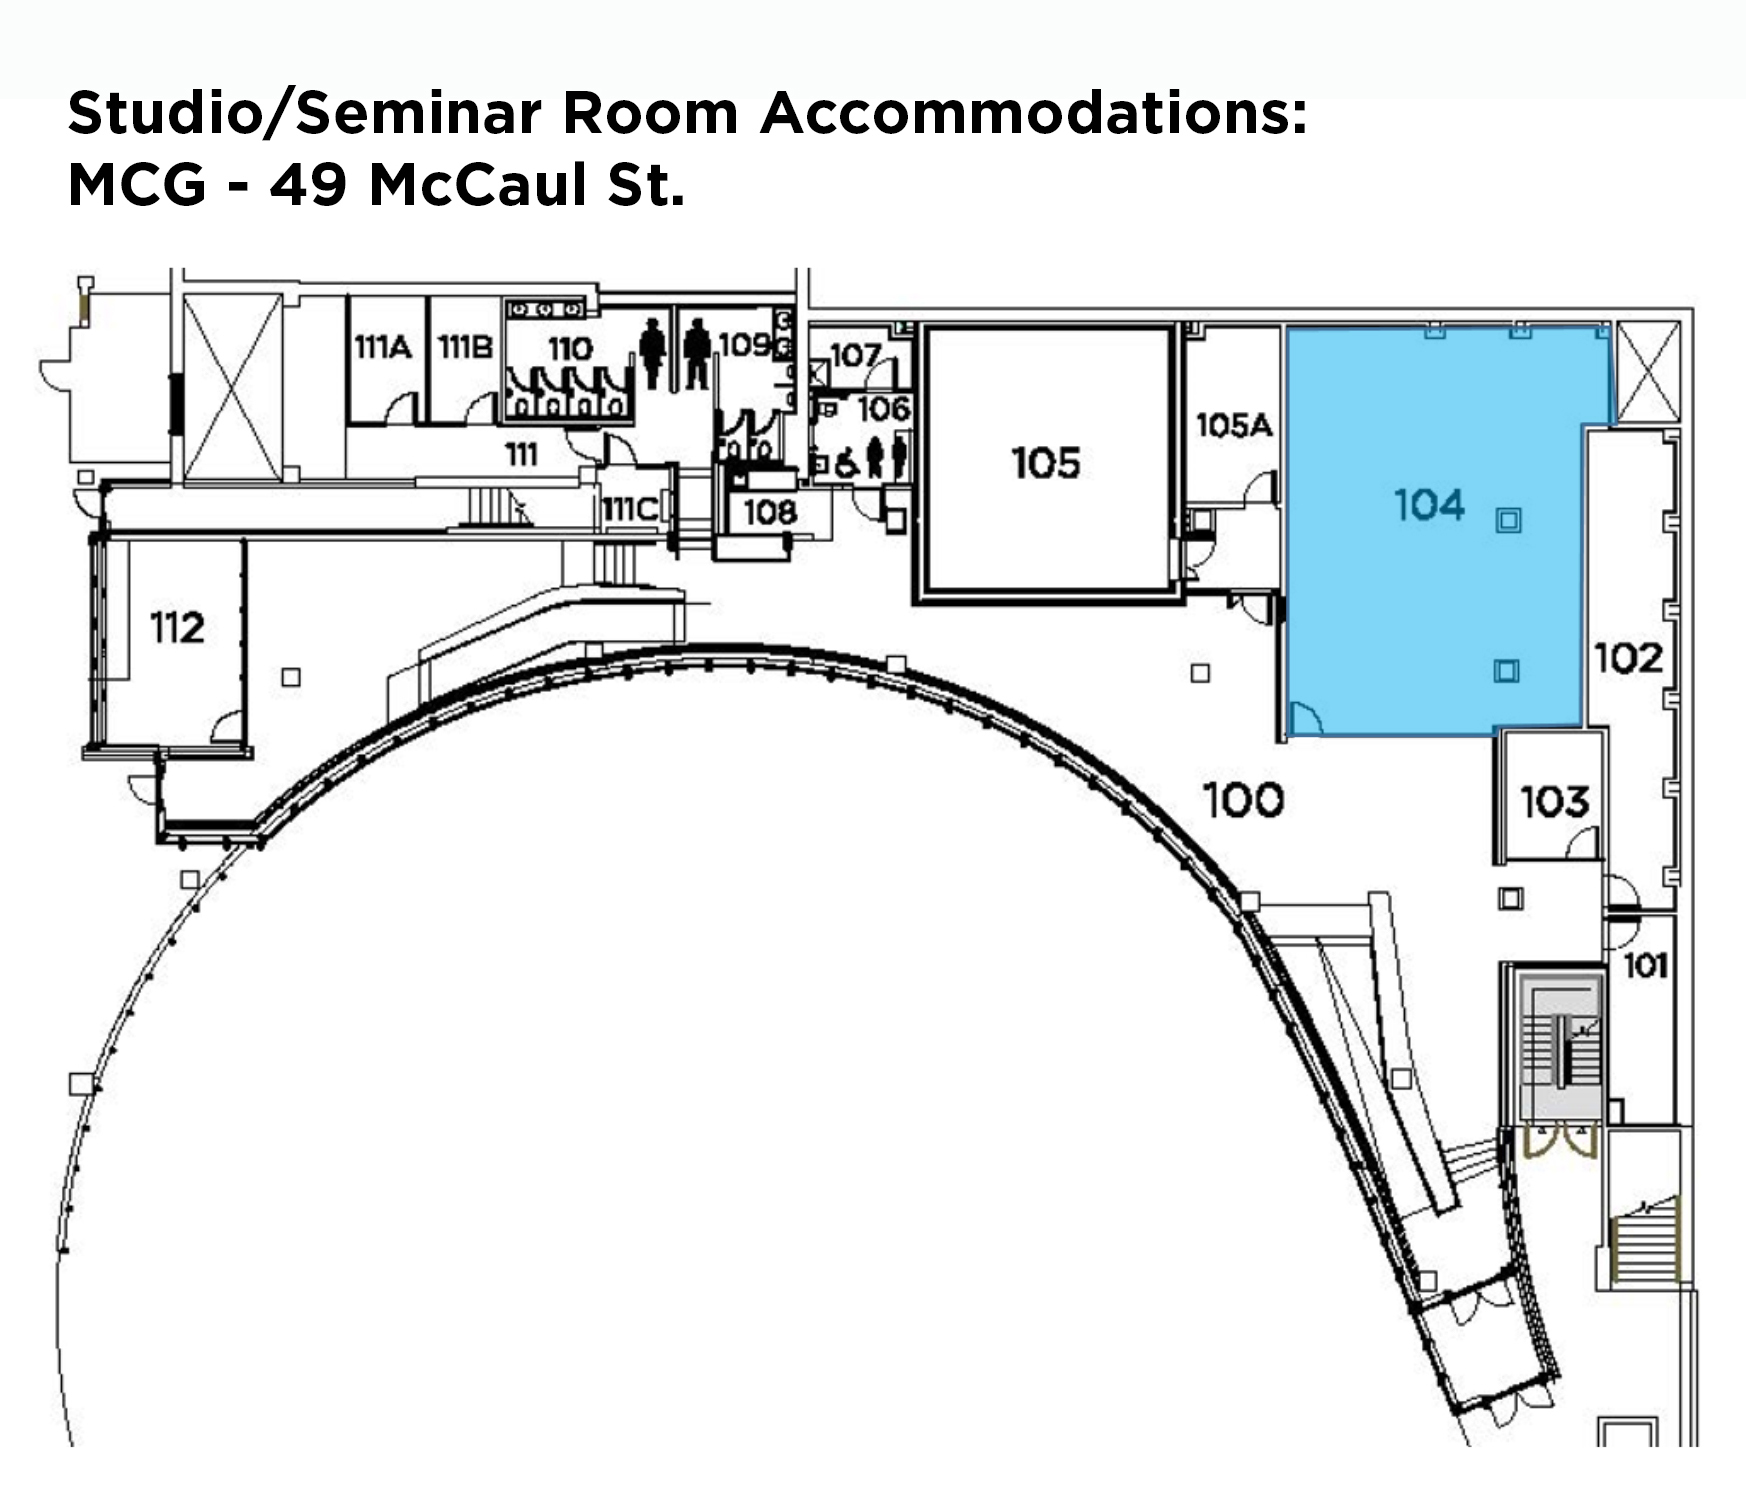 Studio/Seminar accommodations: MCG 49 McCaul